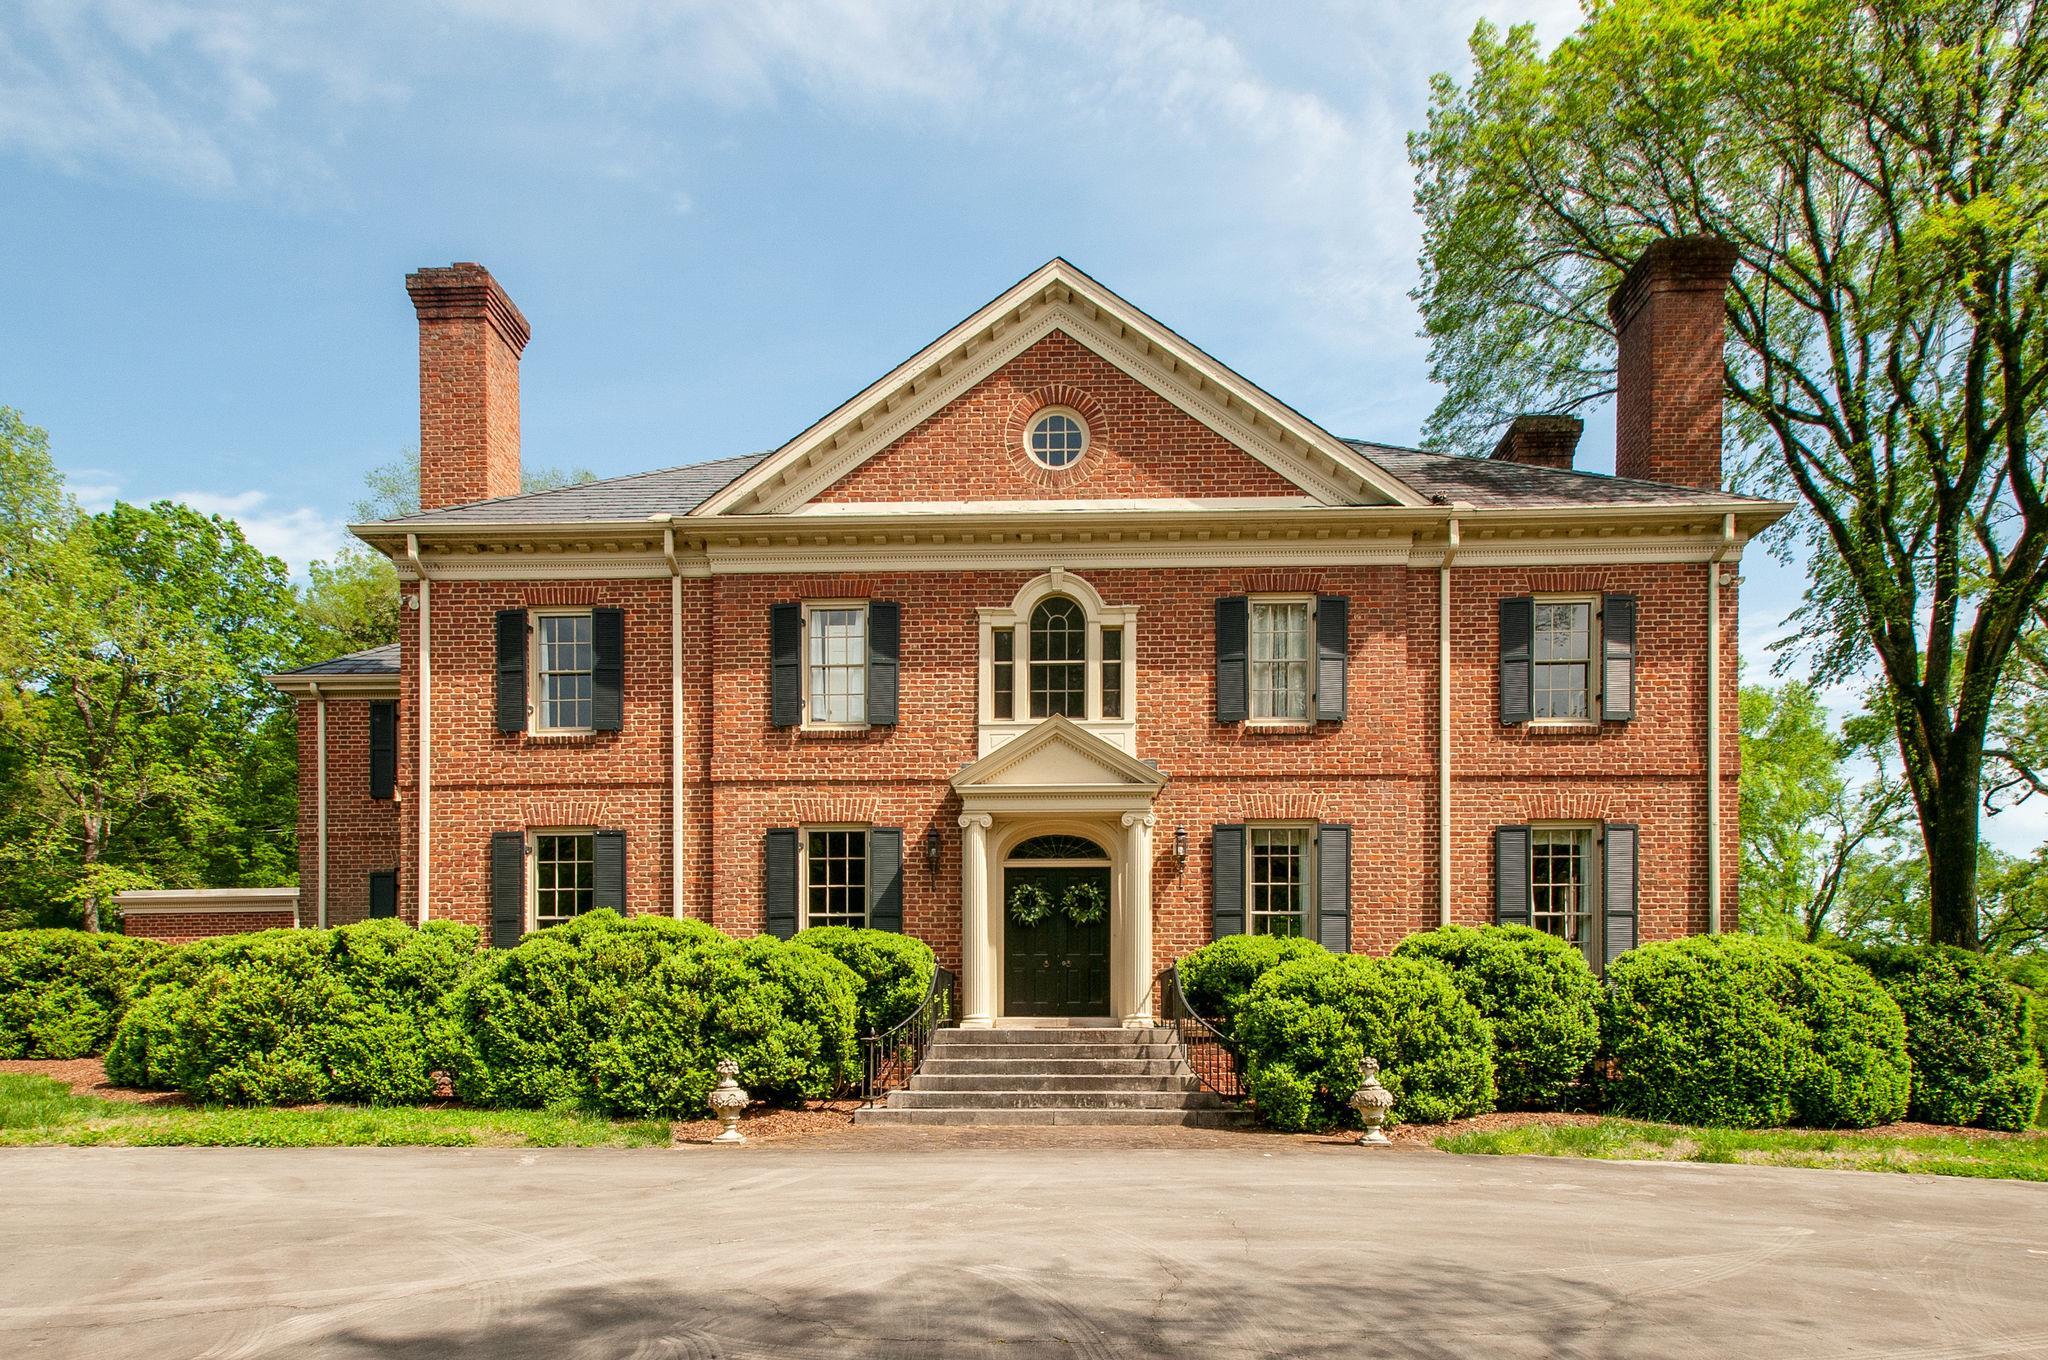 4737 Post Rd, Nashville, TN 37205 - Nashville, TN real estate listing